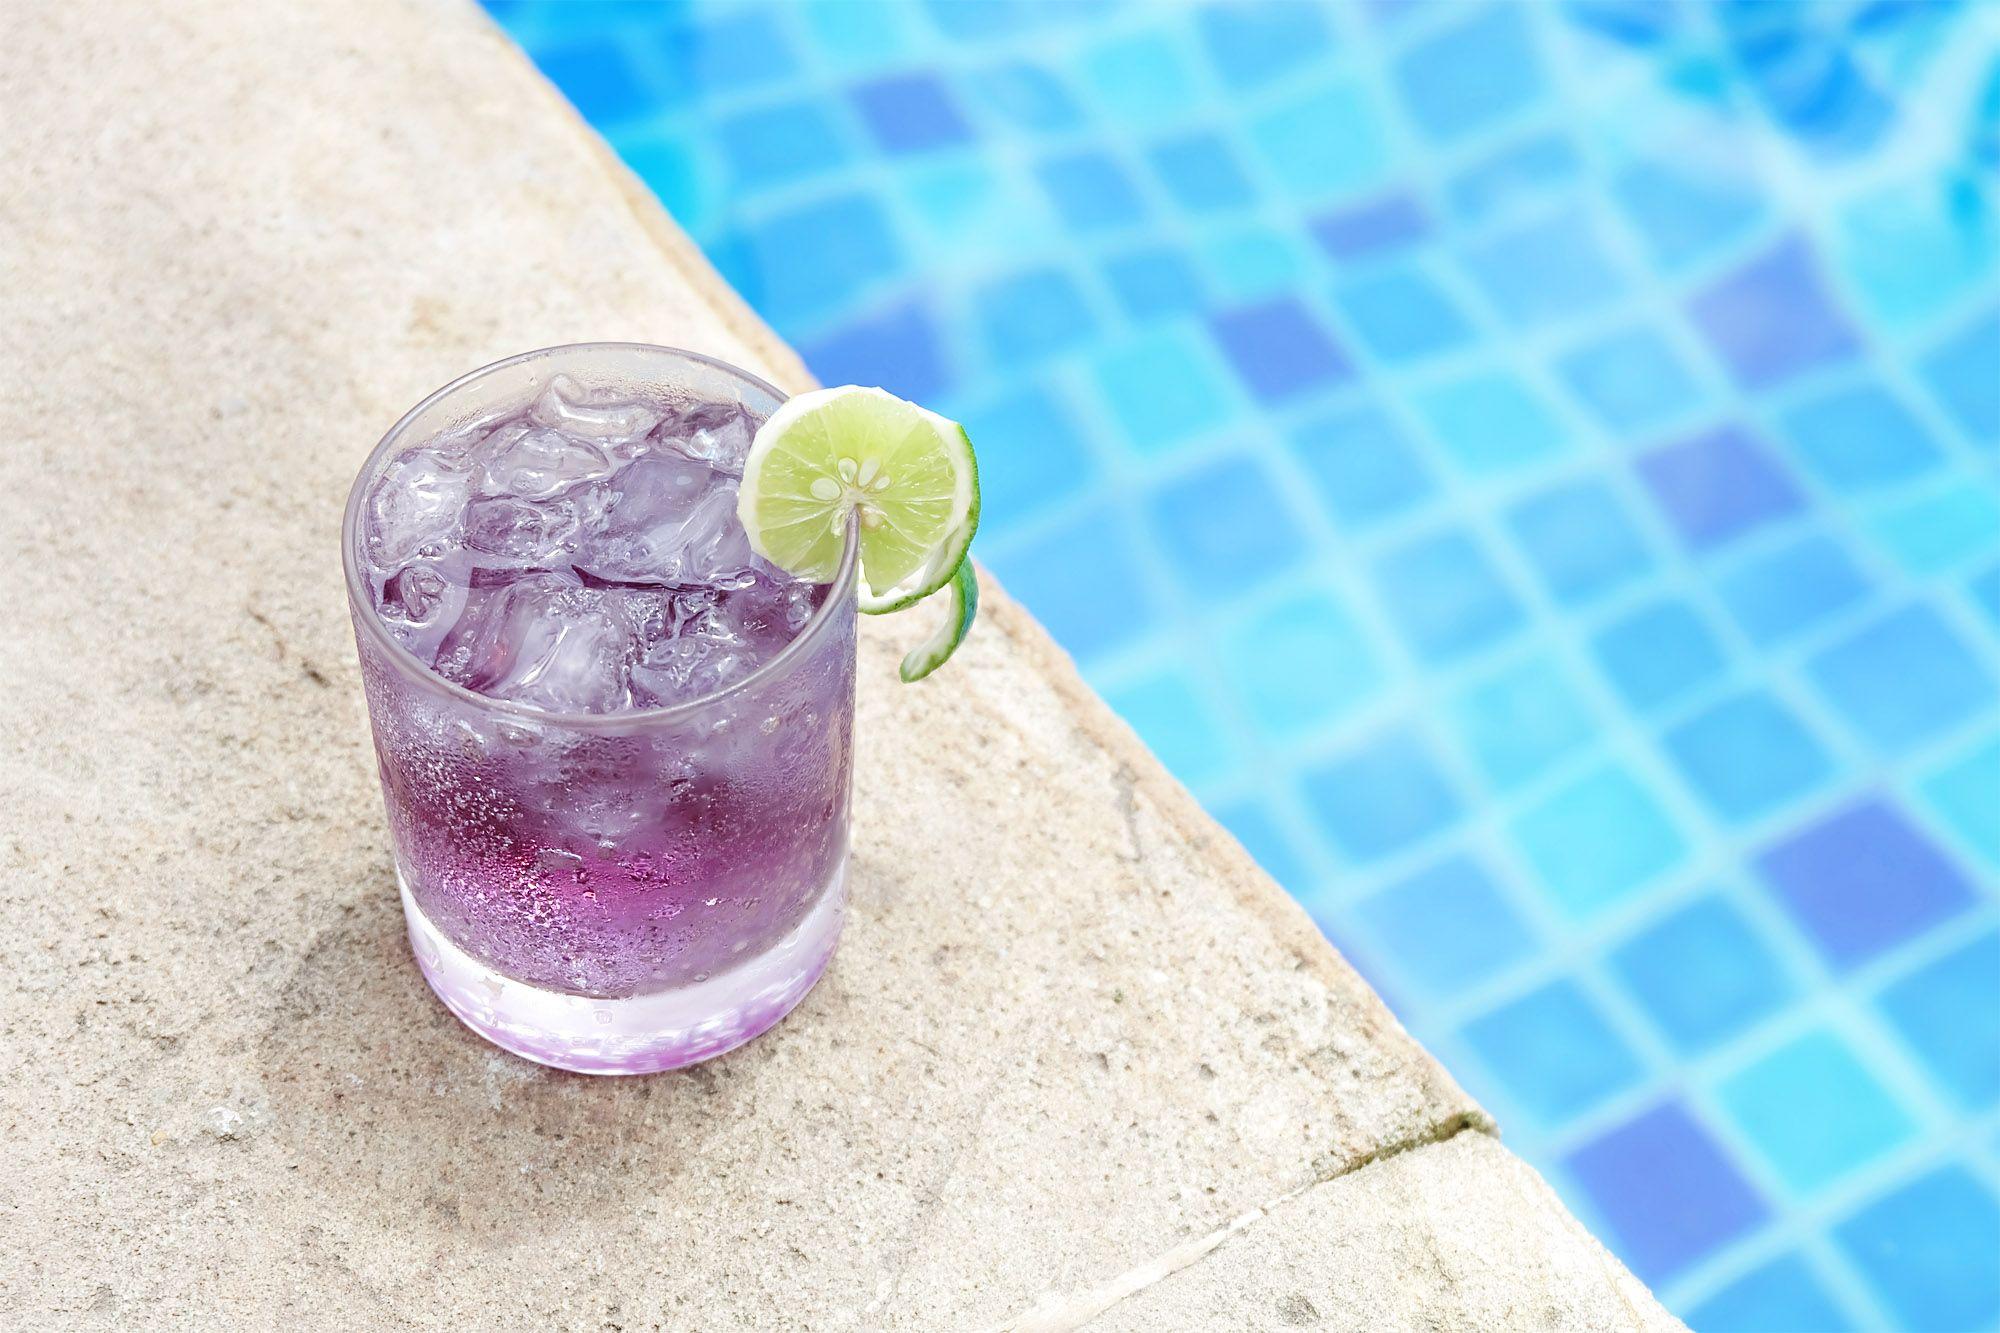 Good news, it's cocktail o'clock! What's your drink of choice today?  #TheTanjungBenoaBeachResort #TheTanjungBenoa #TheTaoBali #Bali